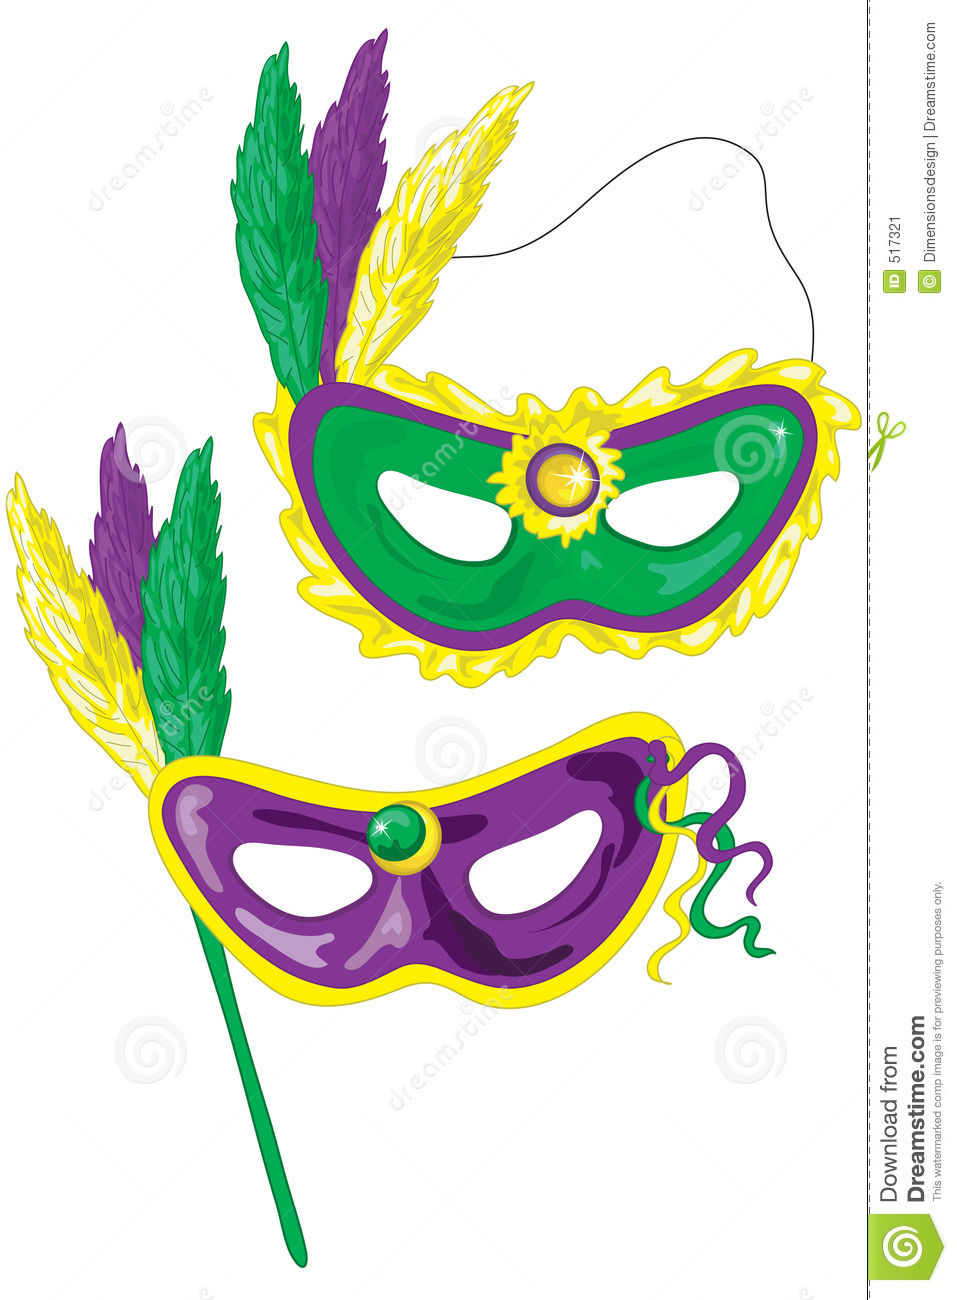 mardi-gras-clipart-mardi-gras-masks-517321.jpg